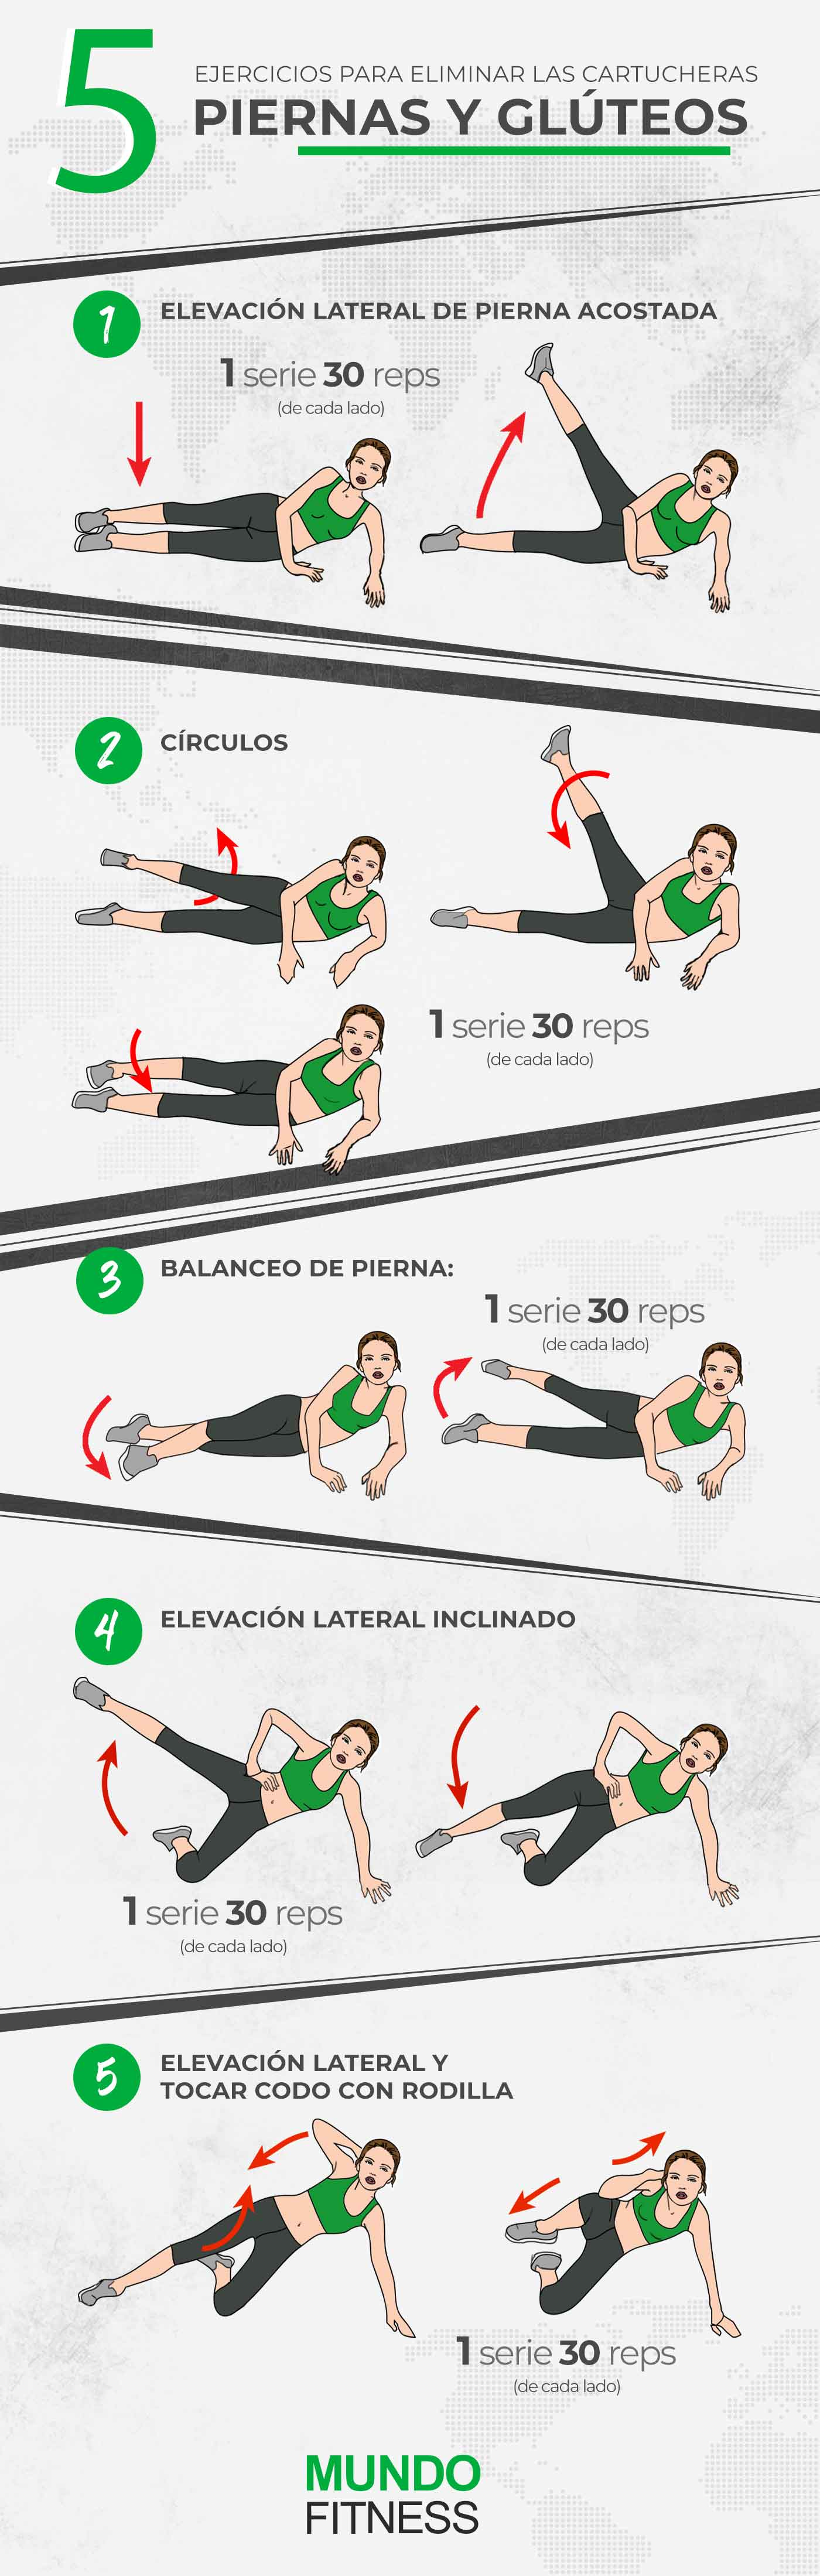 ejercicios-para-eliminar-cartucheras-infografia